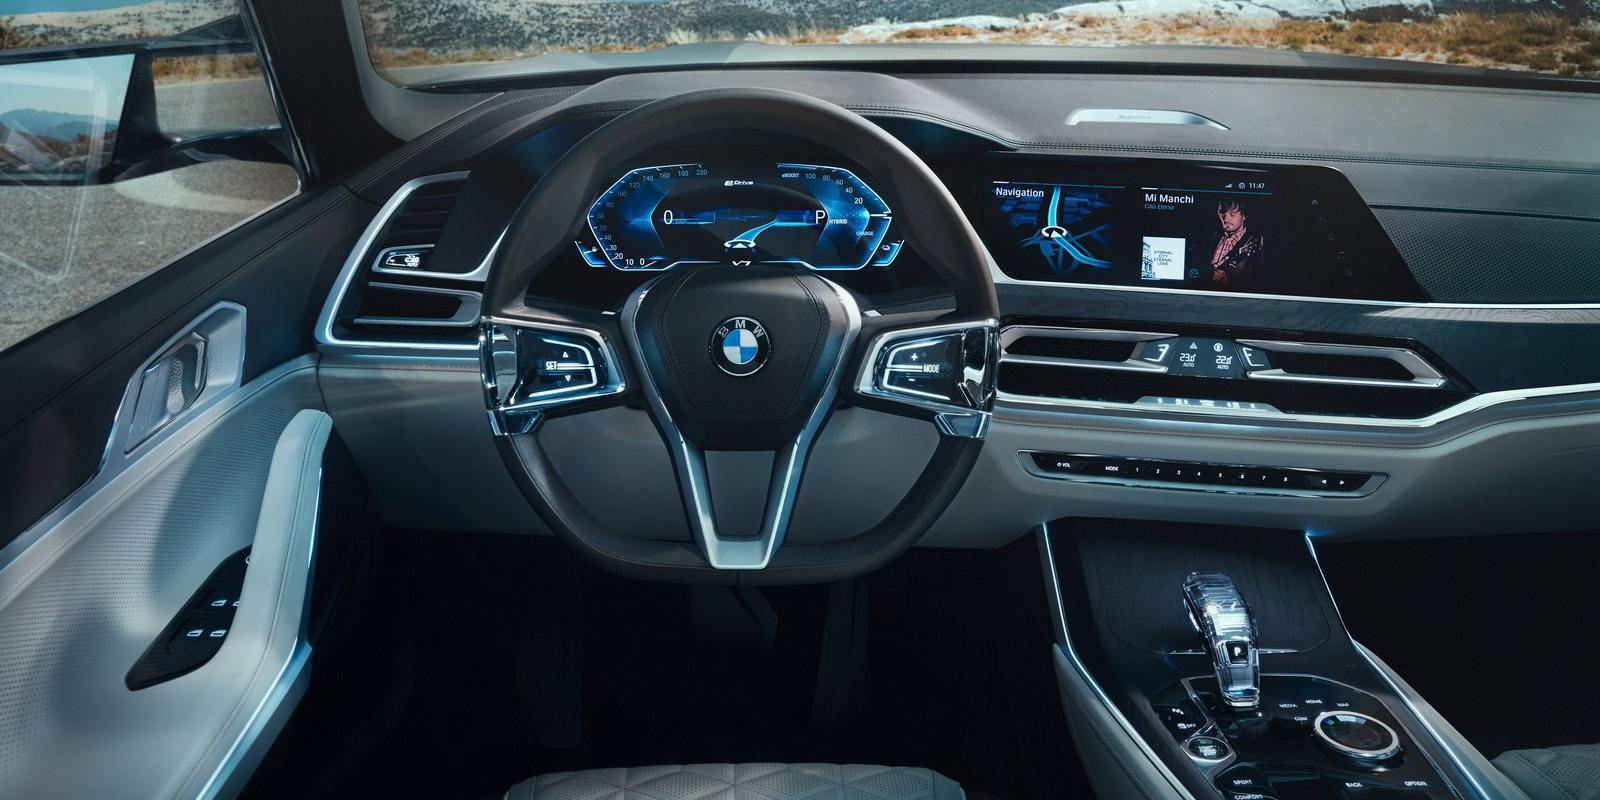 2018 bmw x7. plain 2018 bmw x7 concept interior for 2018 bmw x7 s